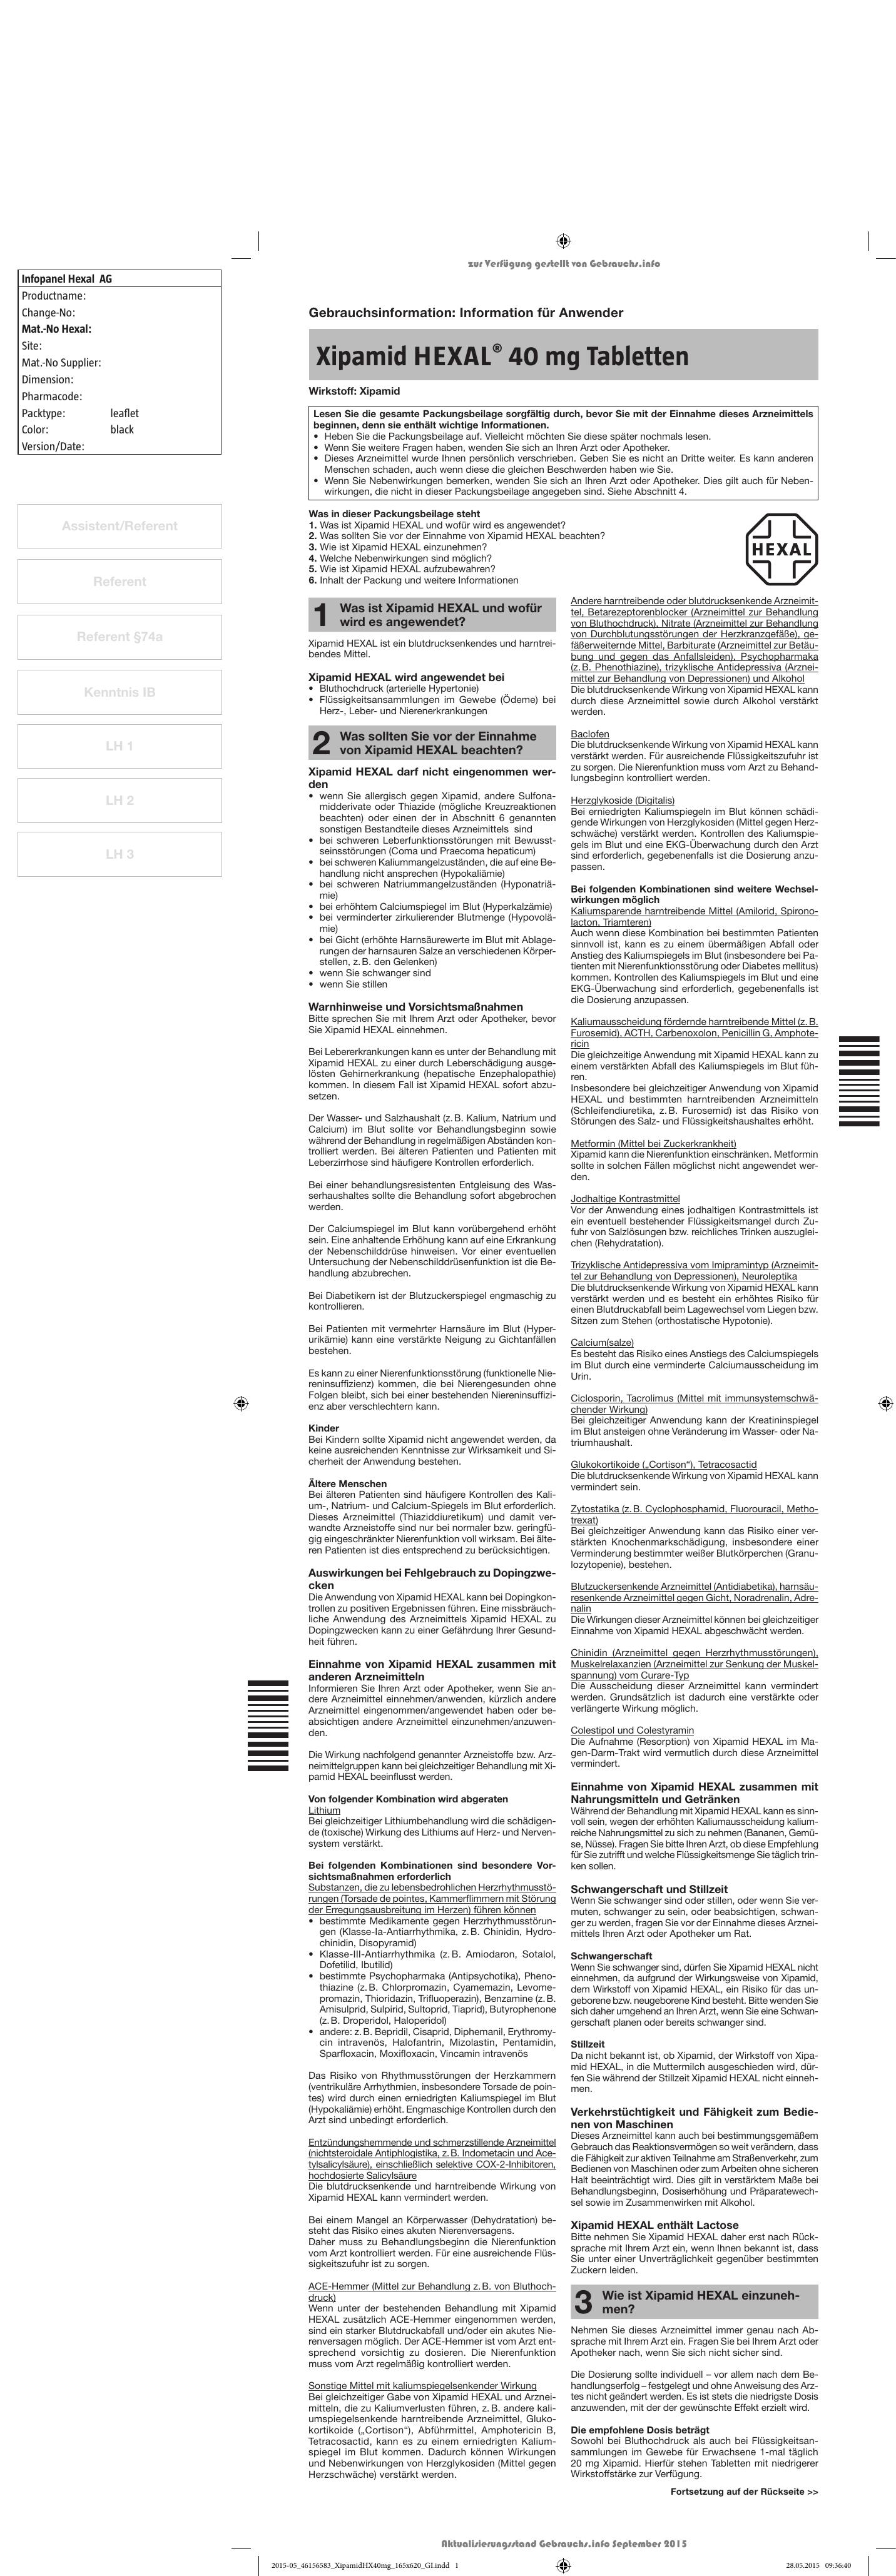 Xipamid HEXAL® 40 mg Tabletten - Shop